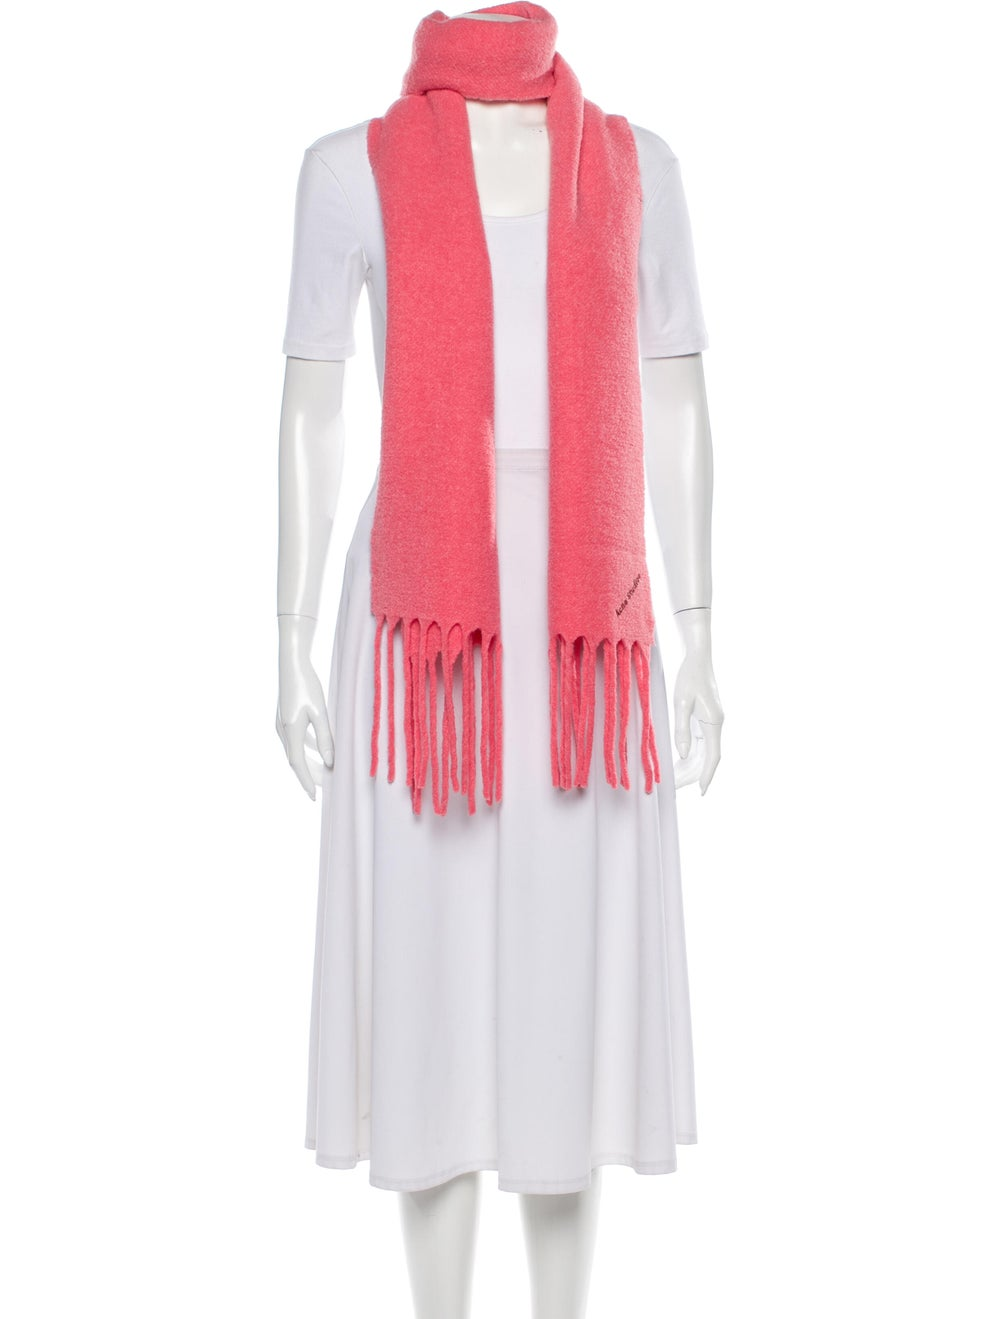 Acne Studios Villy Knit Scarf Pink - image 3